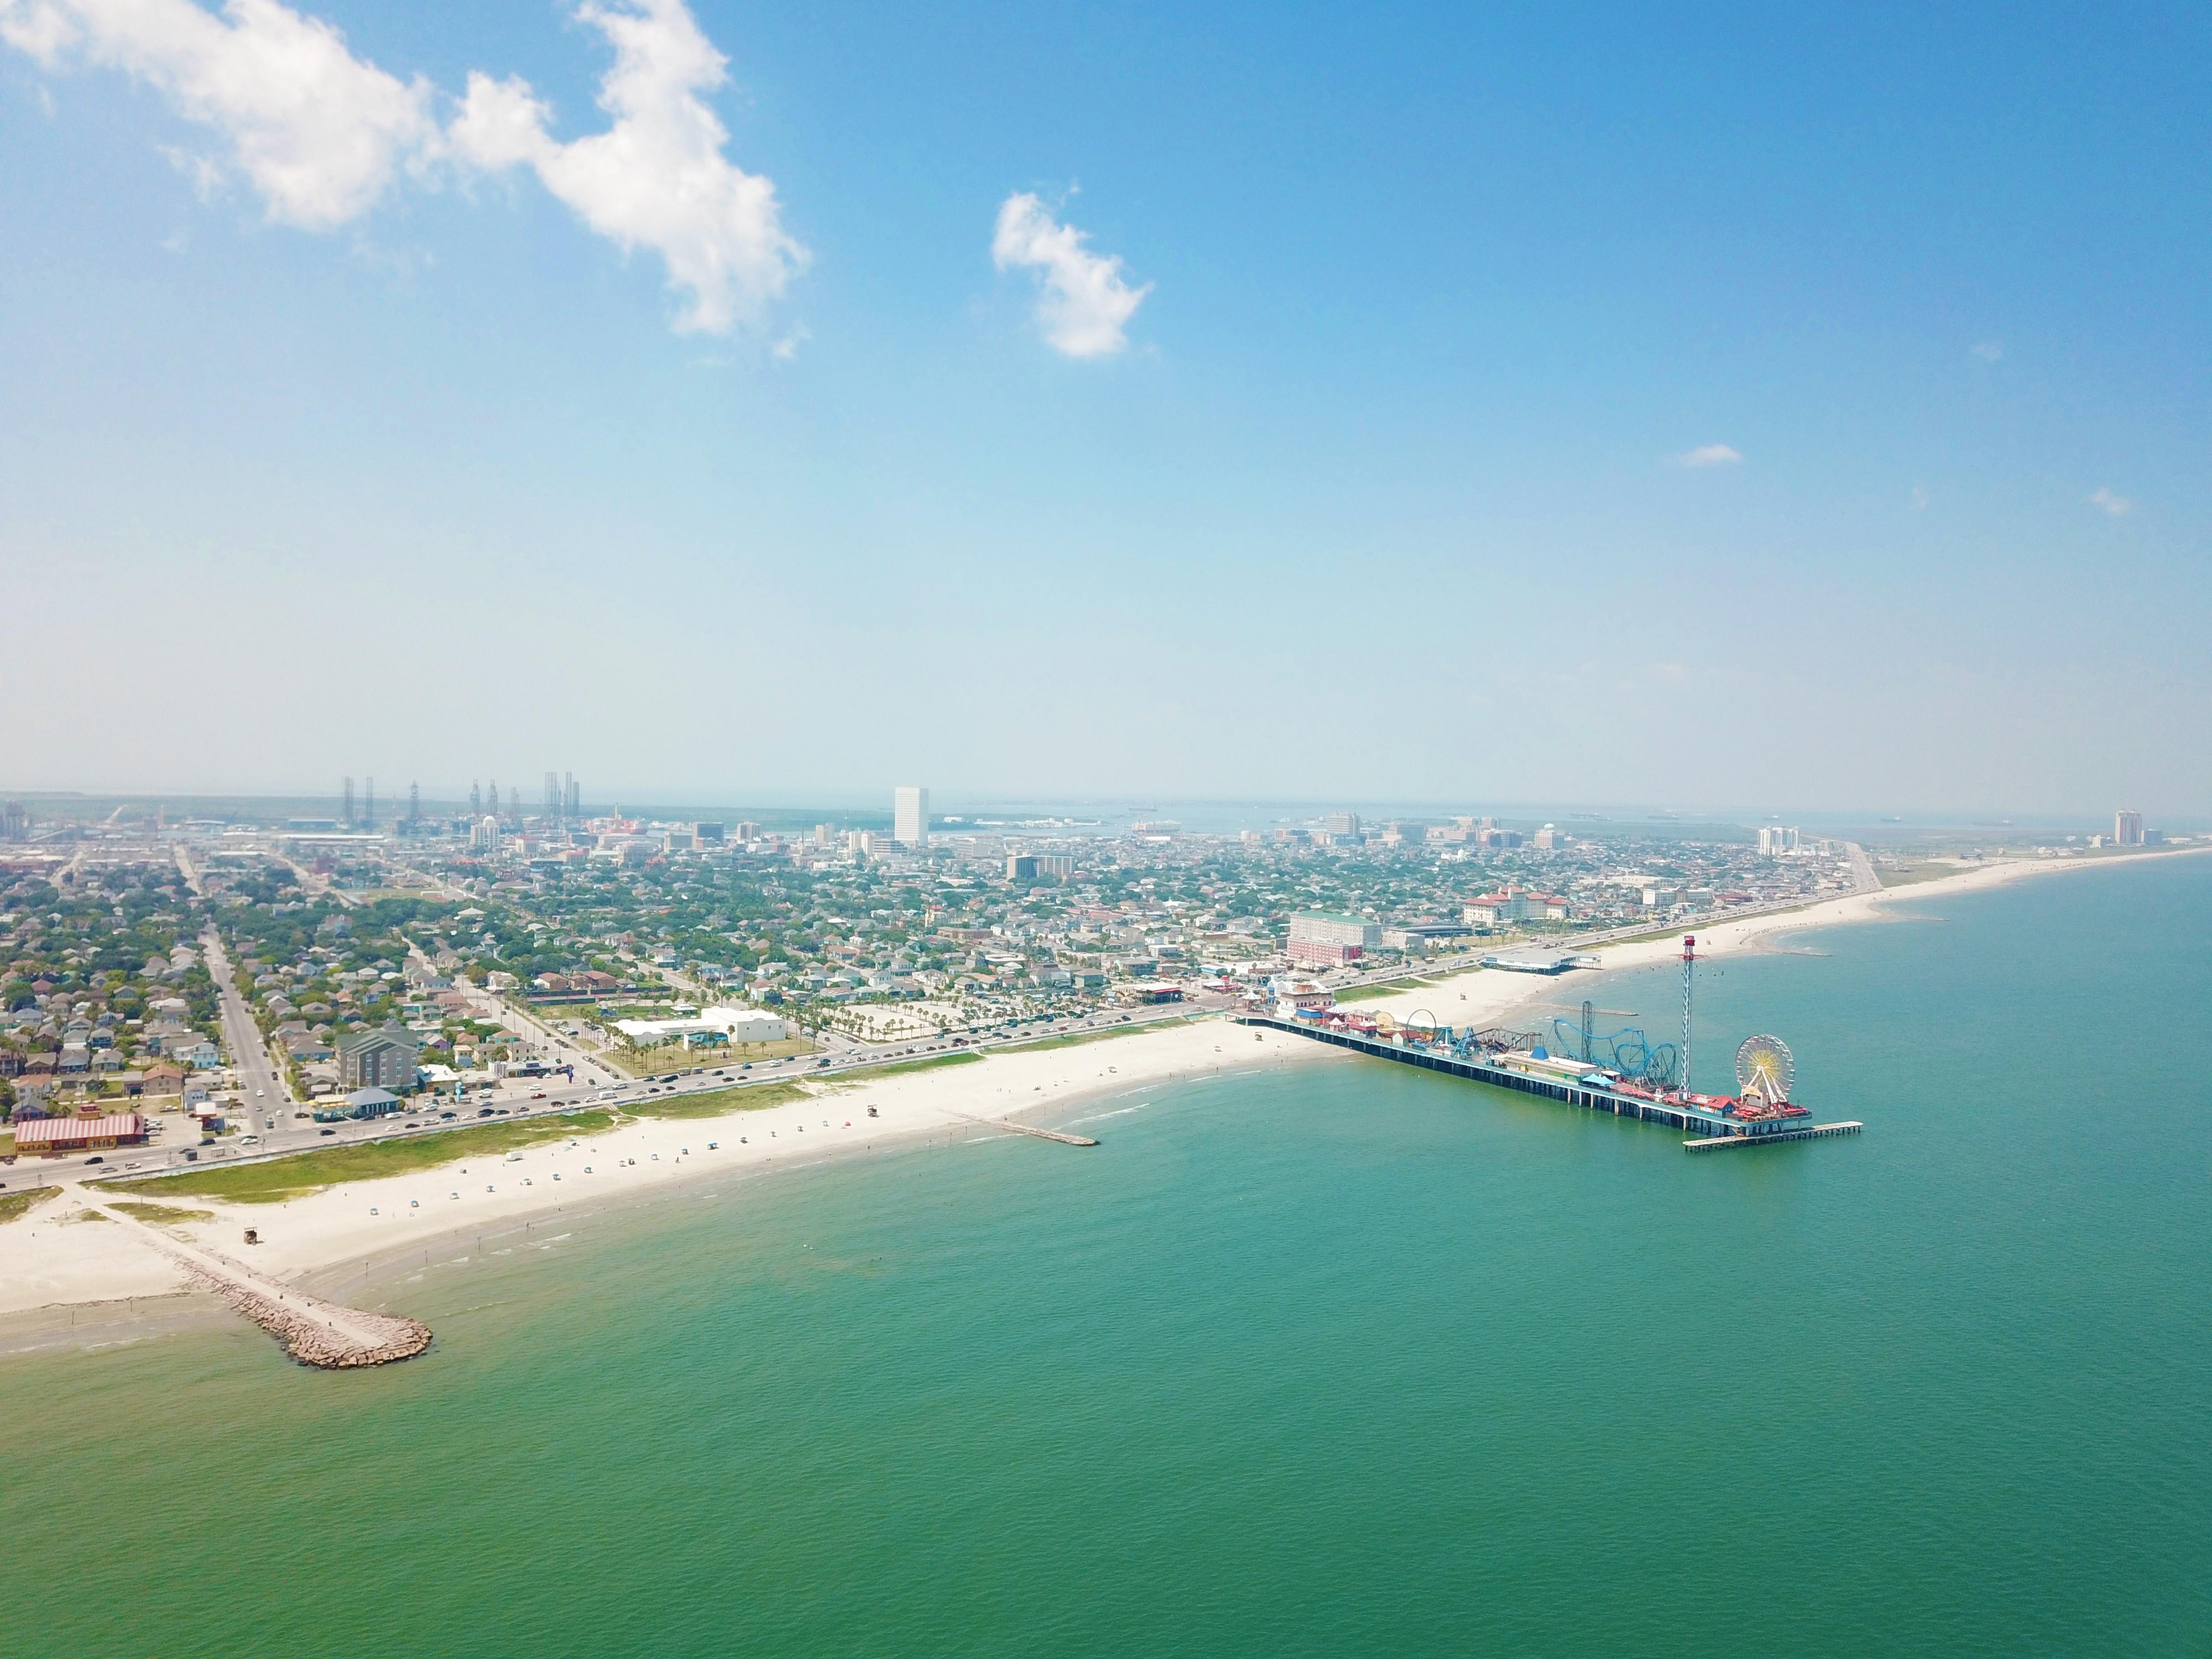 Galveston Island Convention and Visitors Bureau | LinkedIn